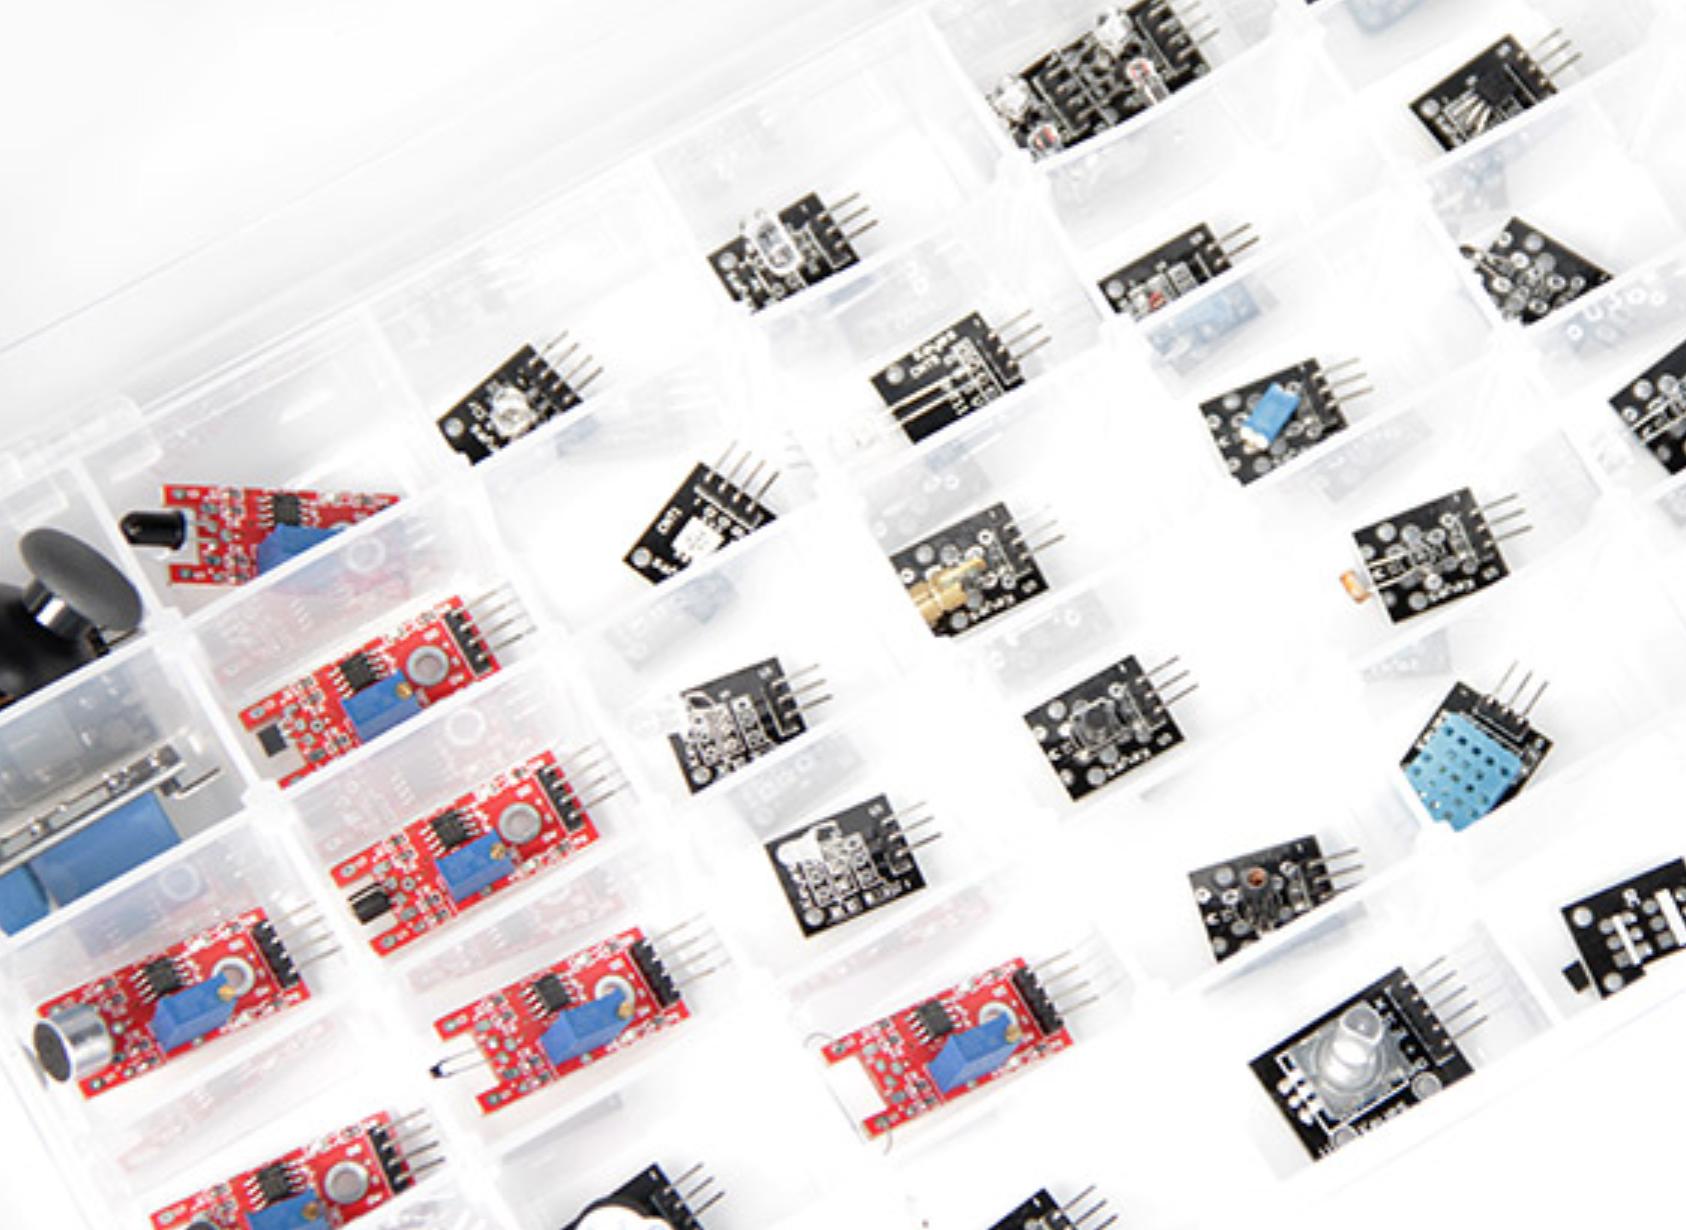 37 in 1 Sensor Module Kit for Arduino พร้อมกล่องพลาสติก